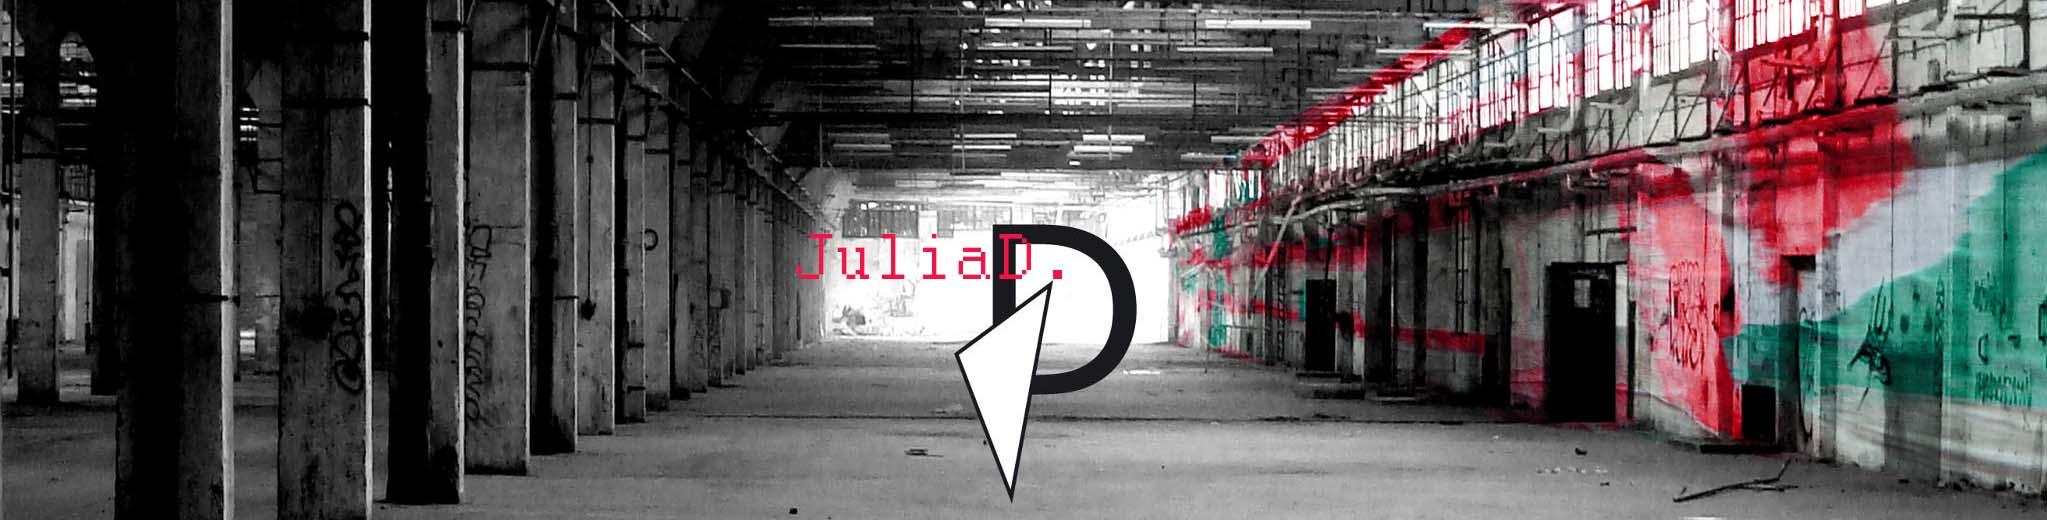 JULIAD BLOG &  ESHOP